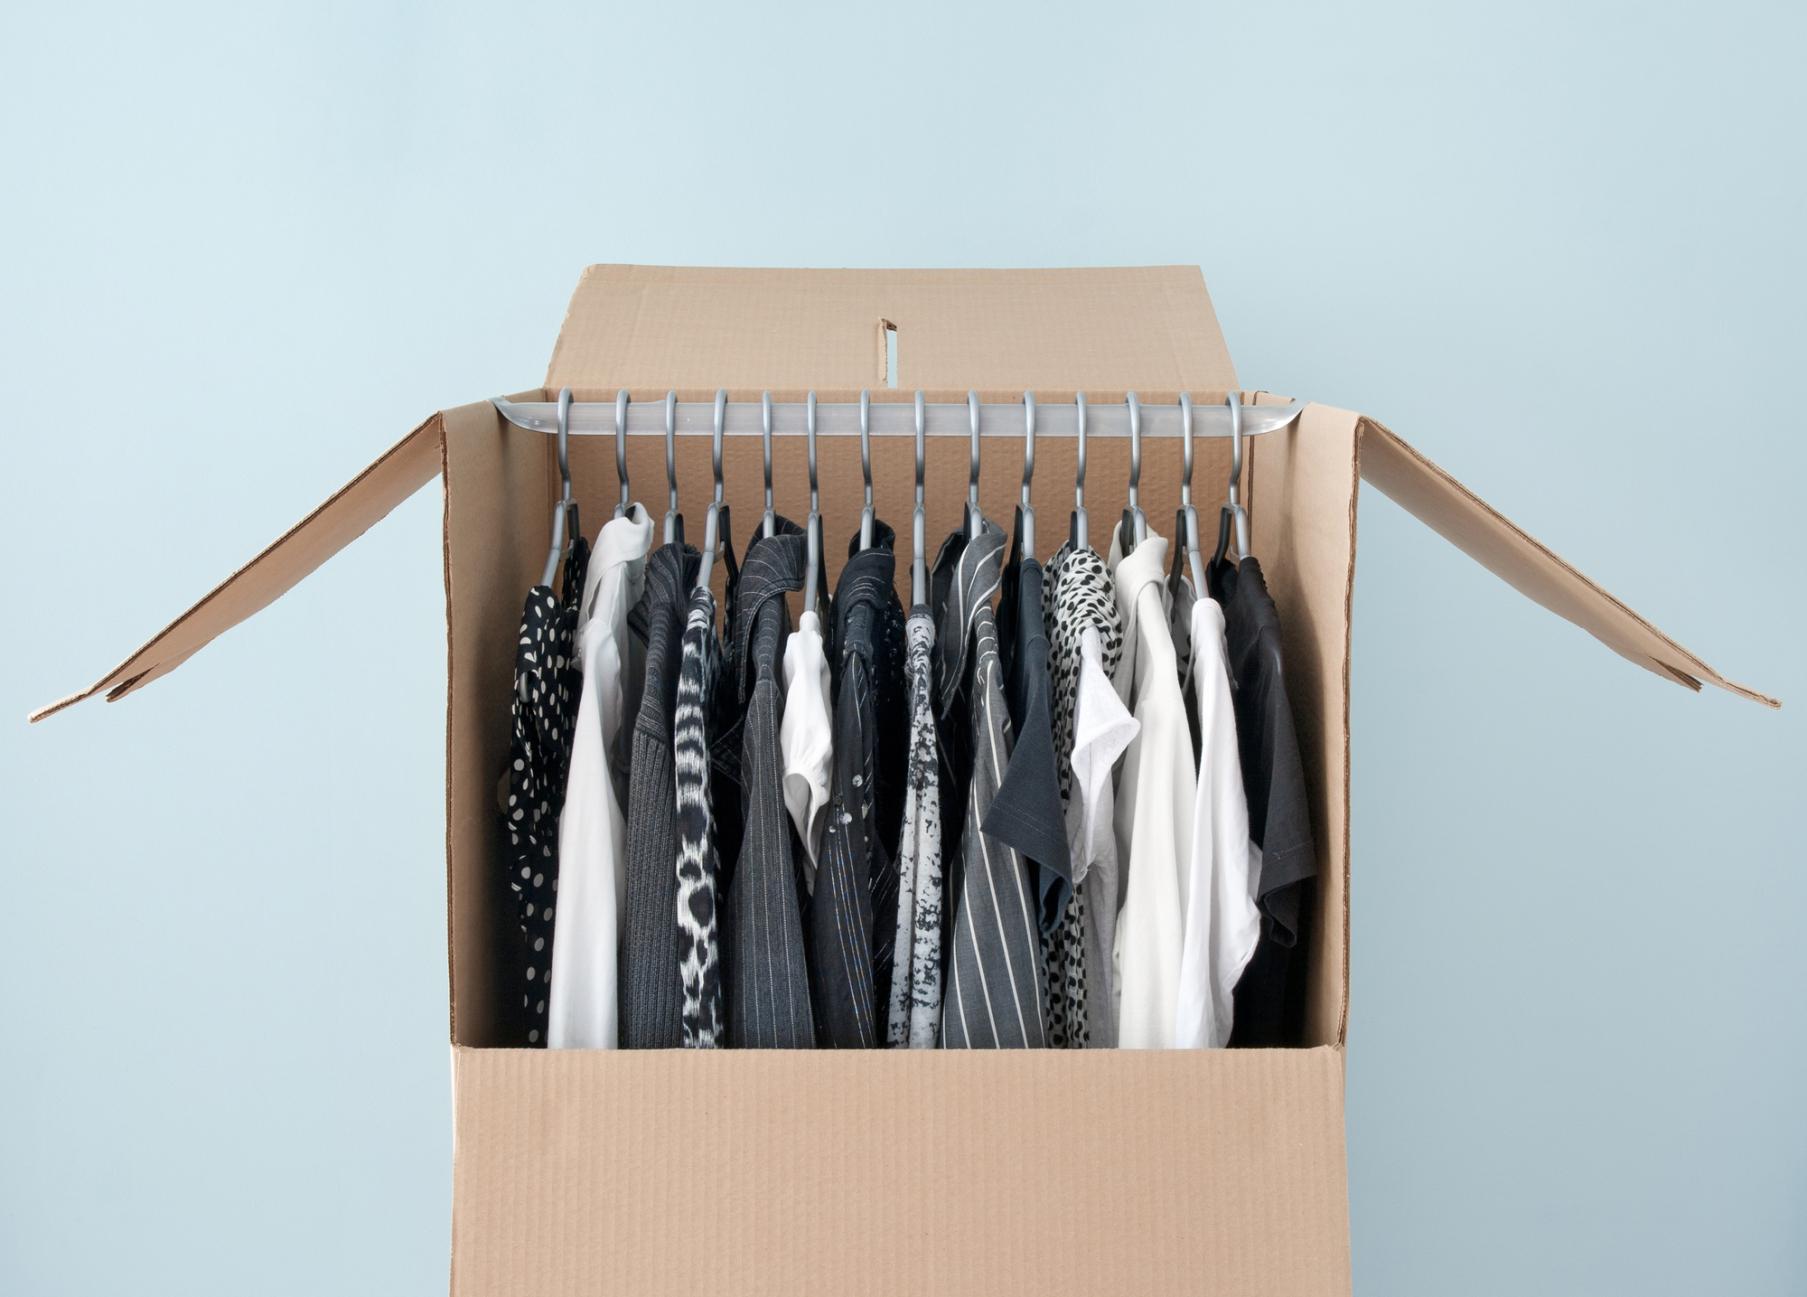 Kleiderkarton für den Umzug